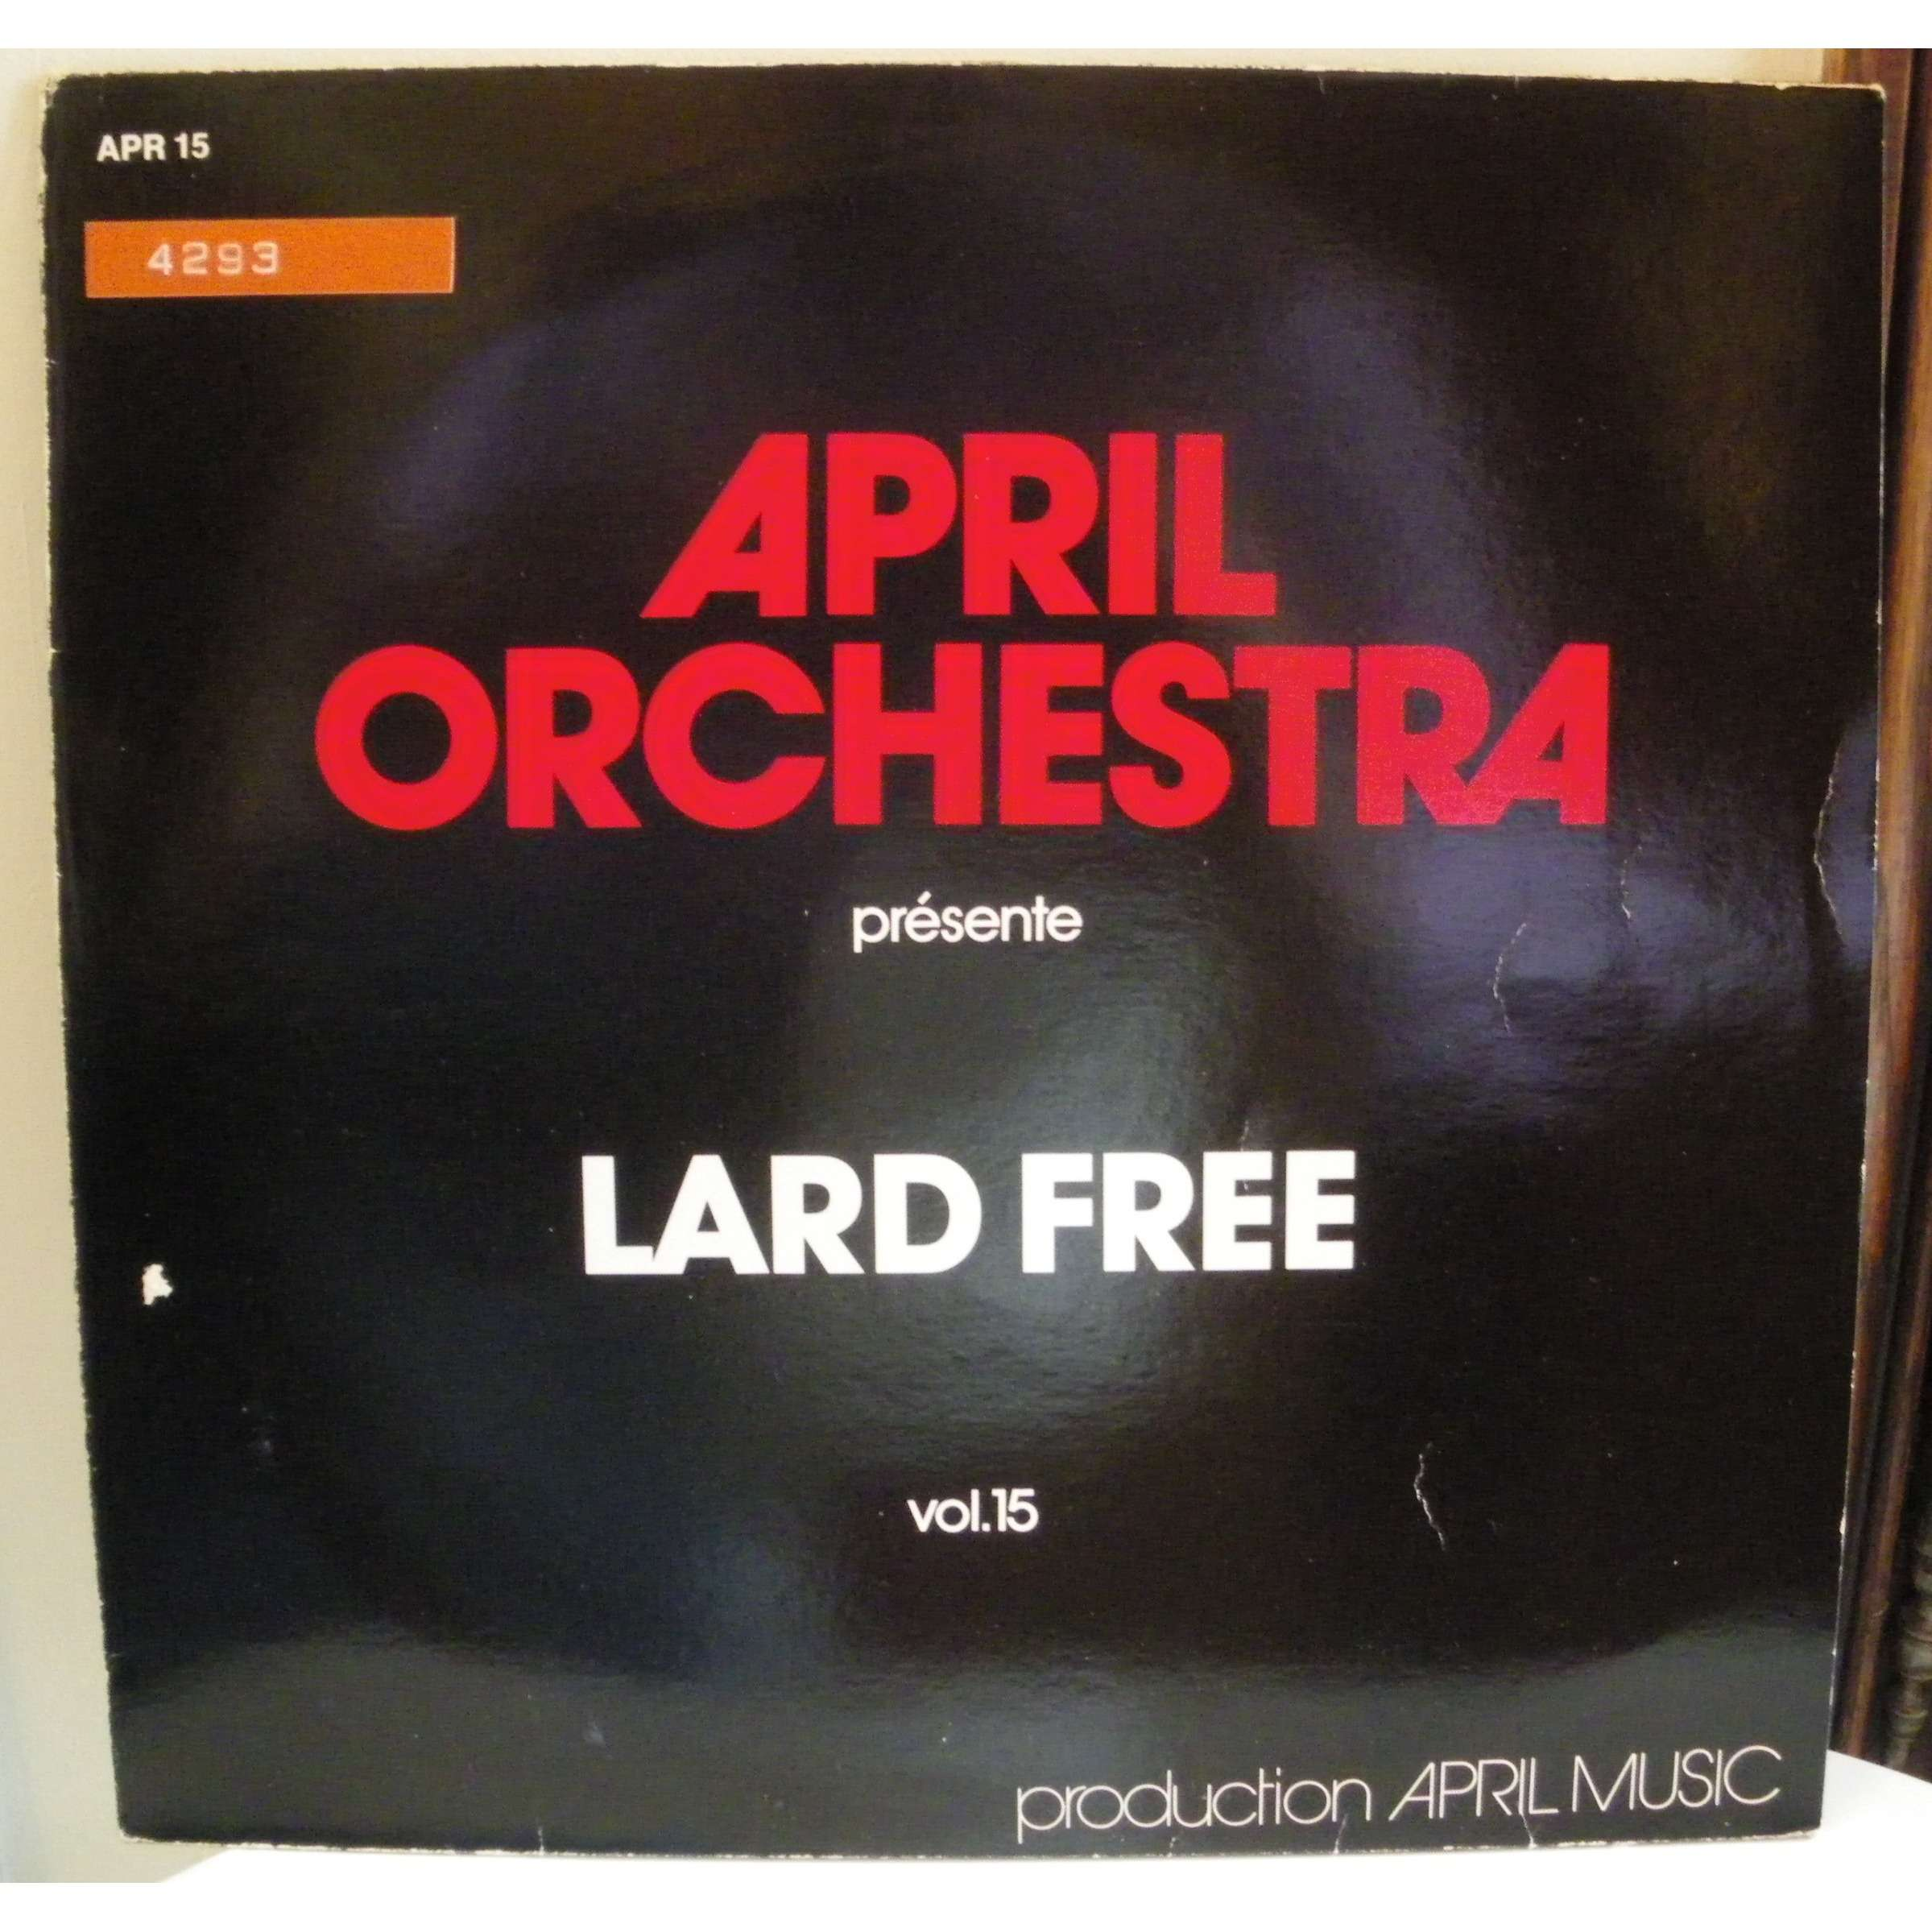 lard free APRIL ORCHESTRA VOL. 15